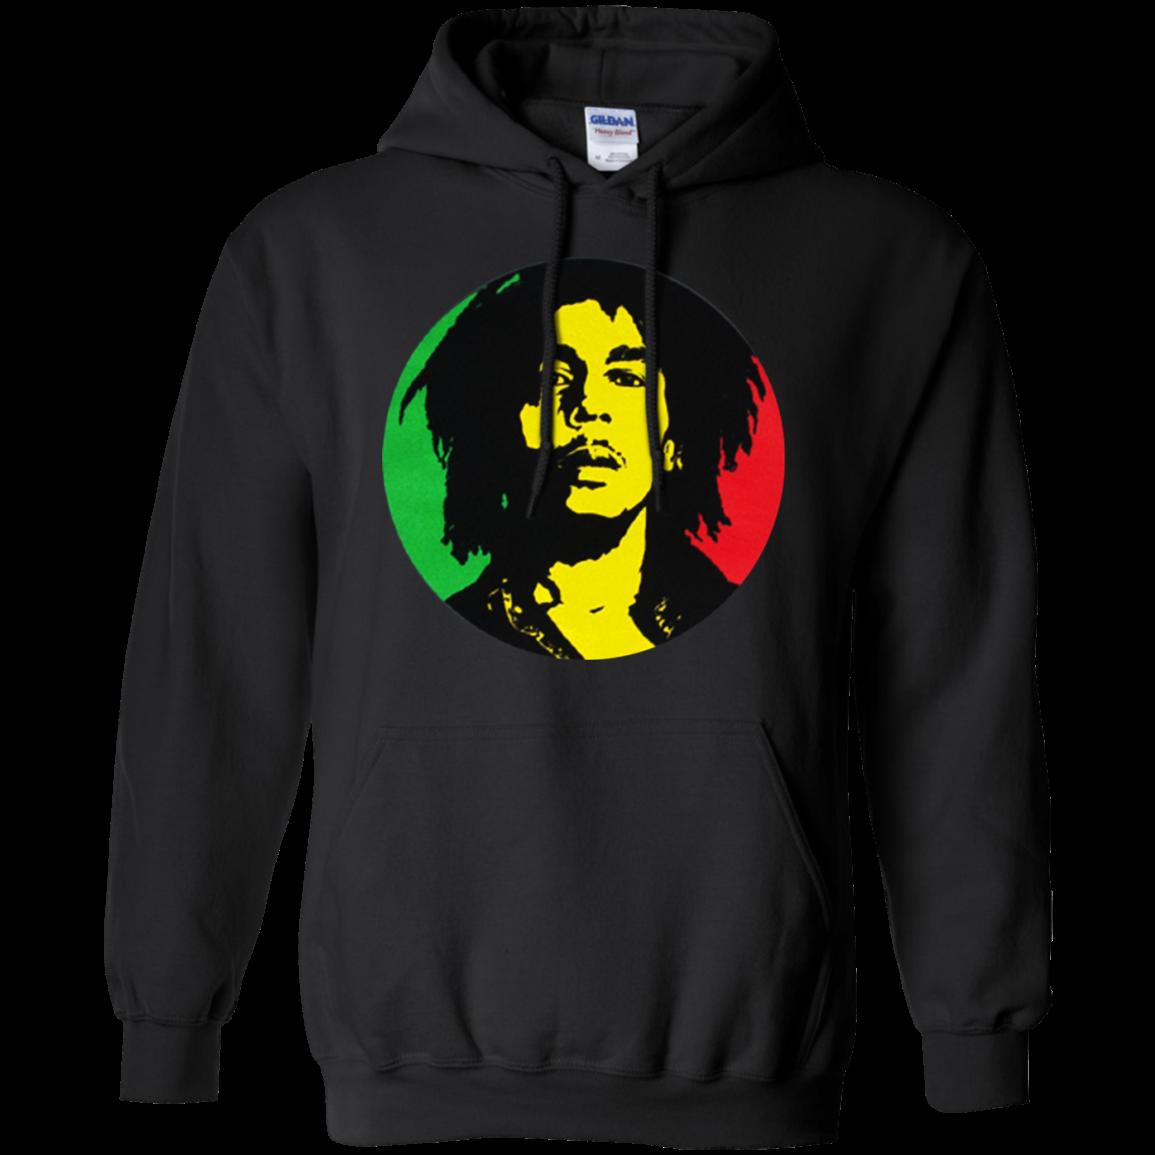 Bob Marley Merch Hoodie Shipping Worldwide NINONINE